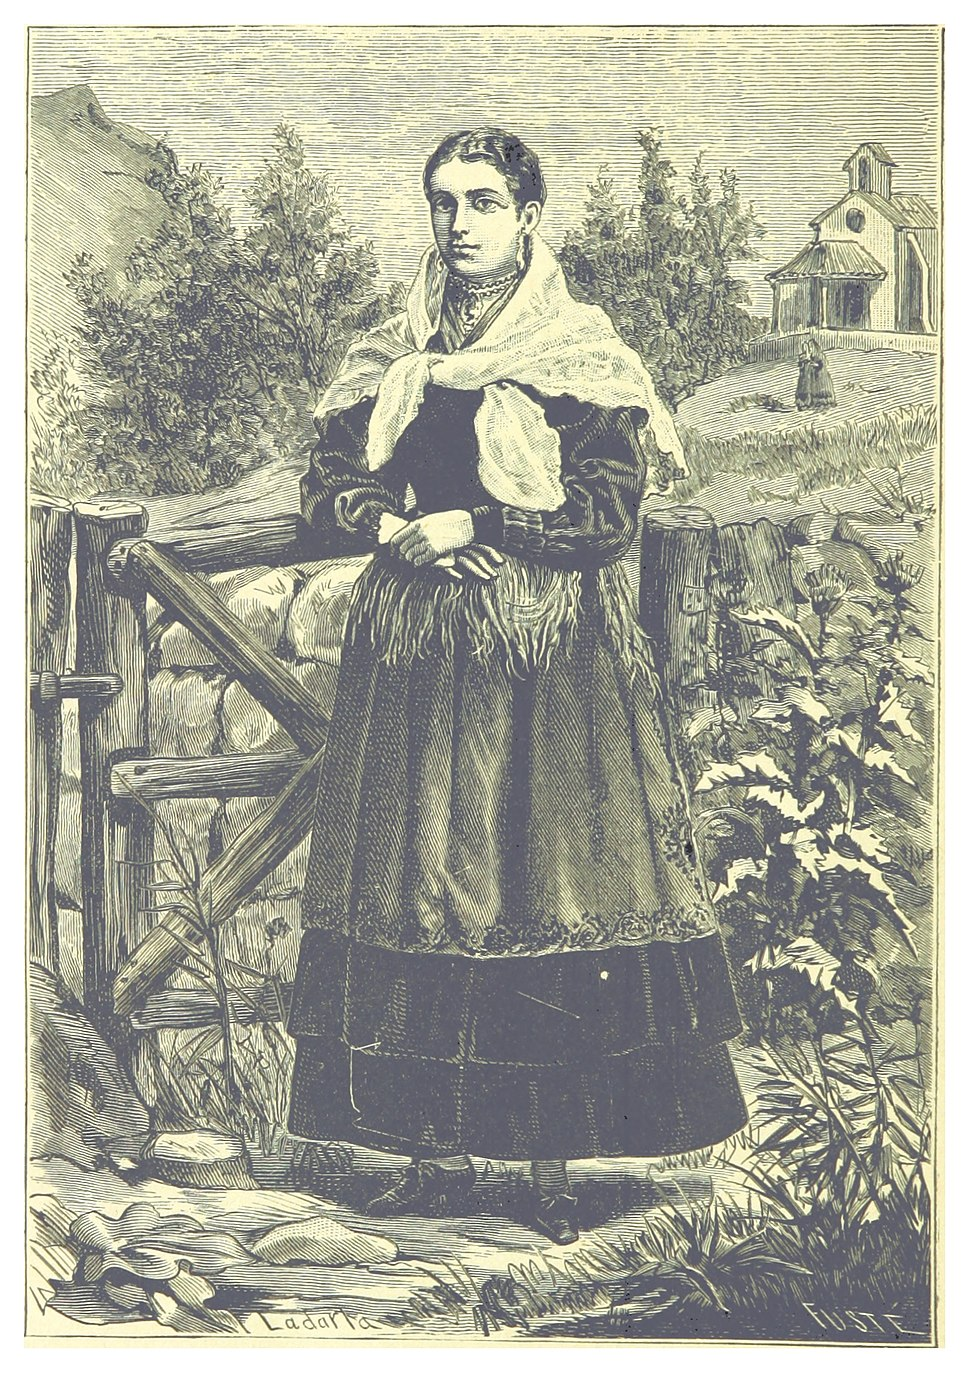 SAEZ(1886) p140 La Mujer Gallega